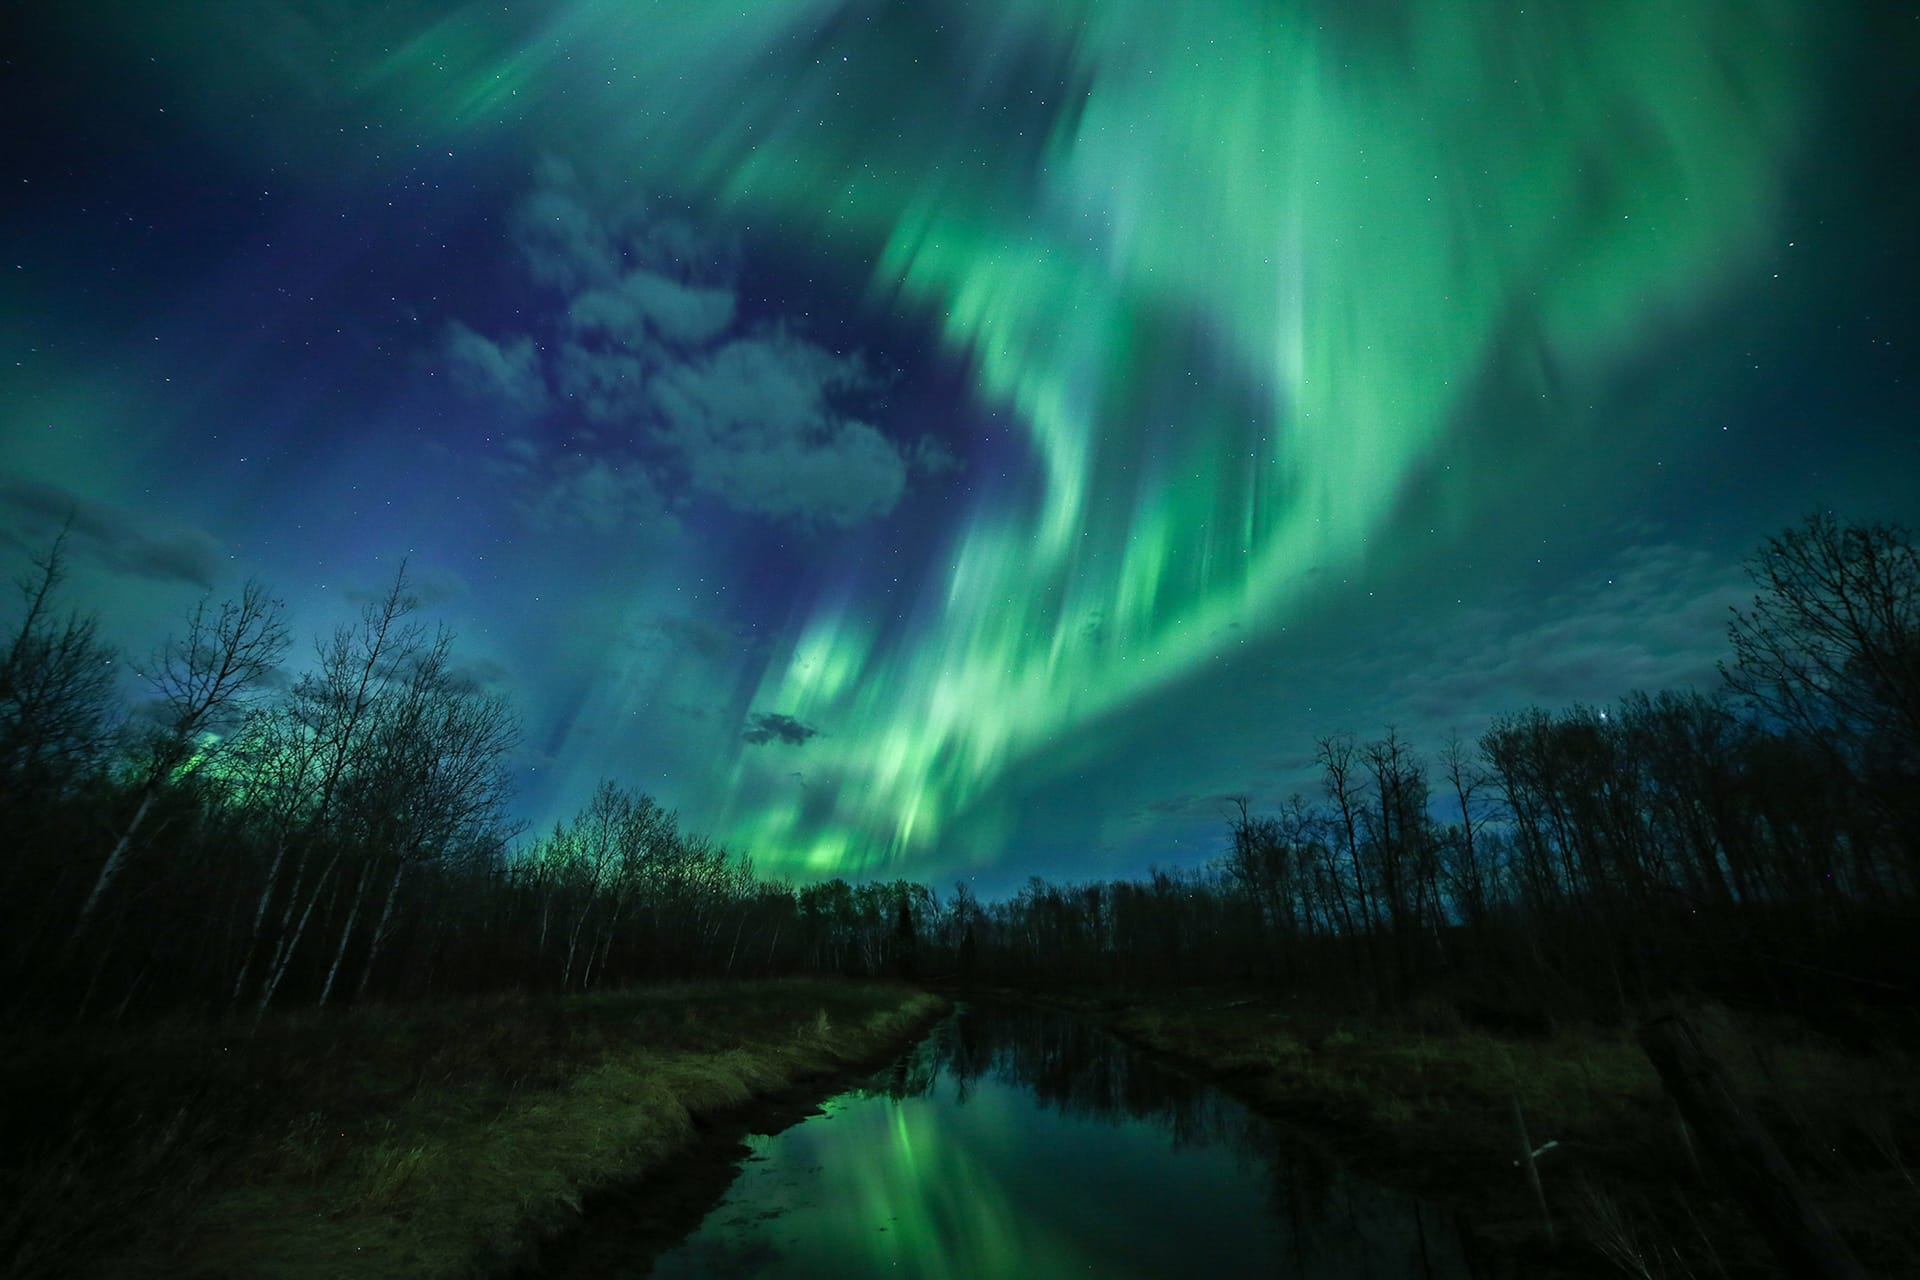 a8-Northern-Lights-photographer-of-the-year-Jeanine-Holowatuik.jpg